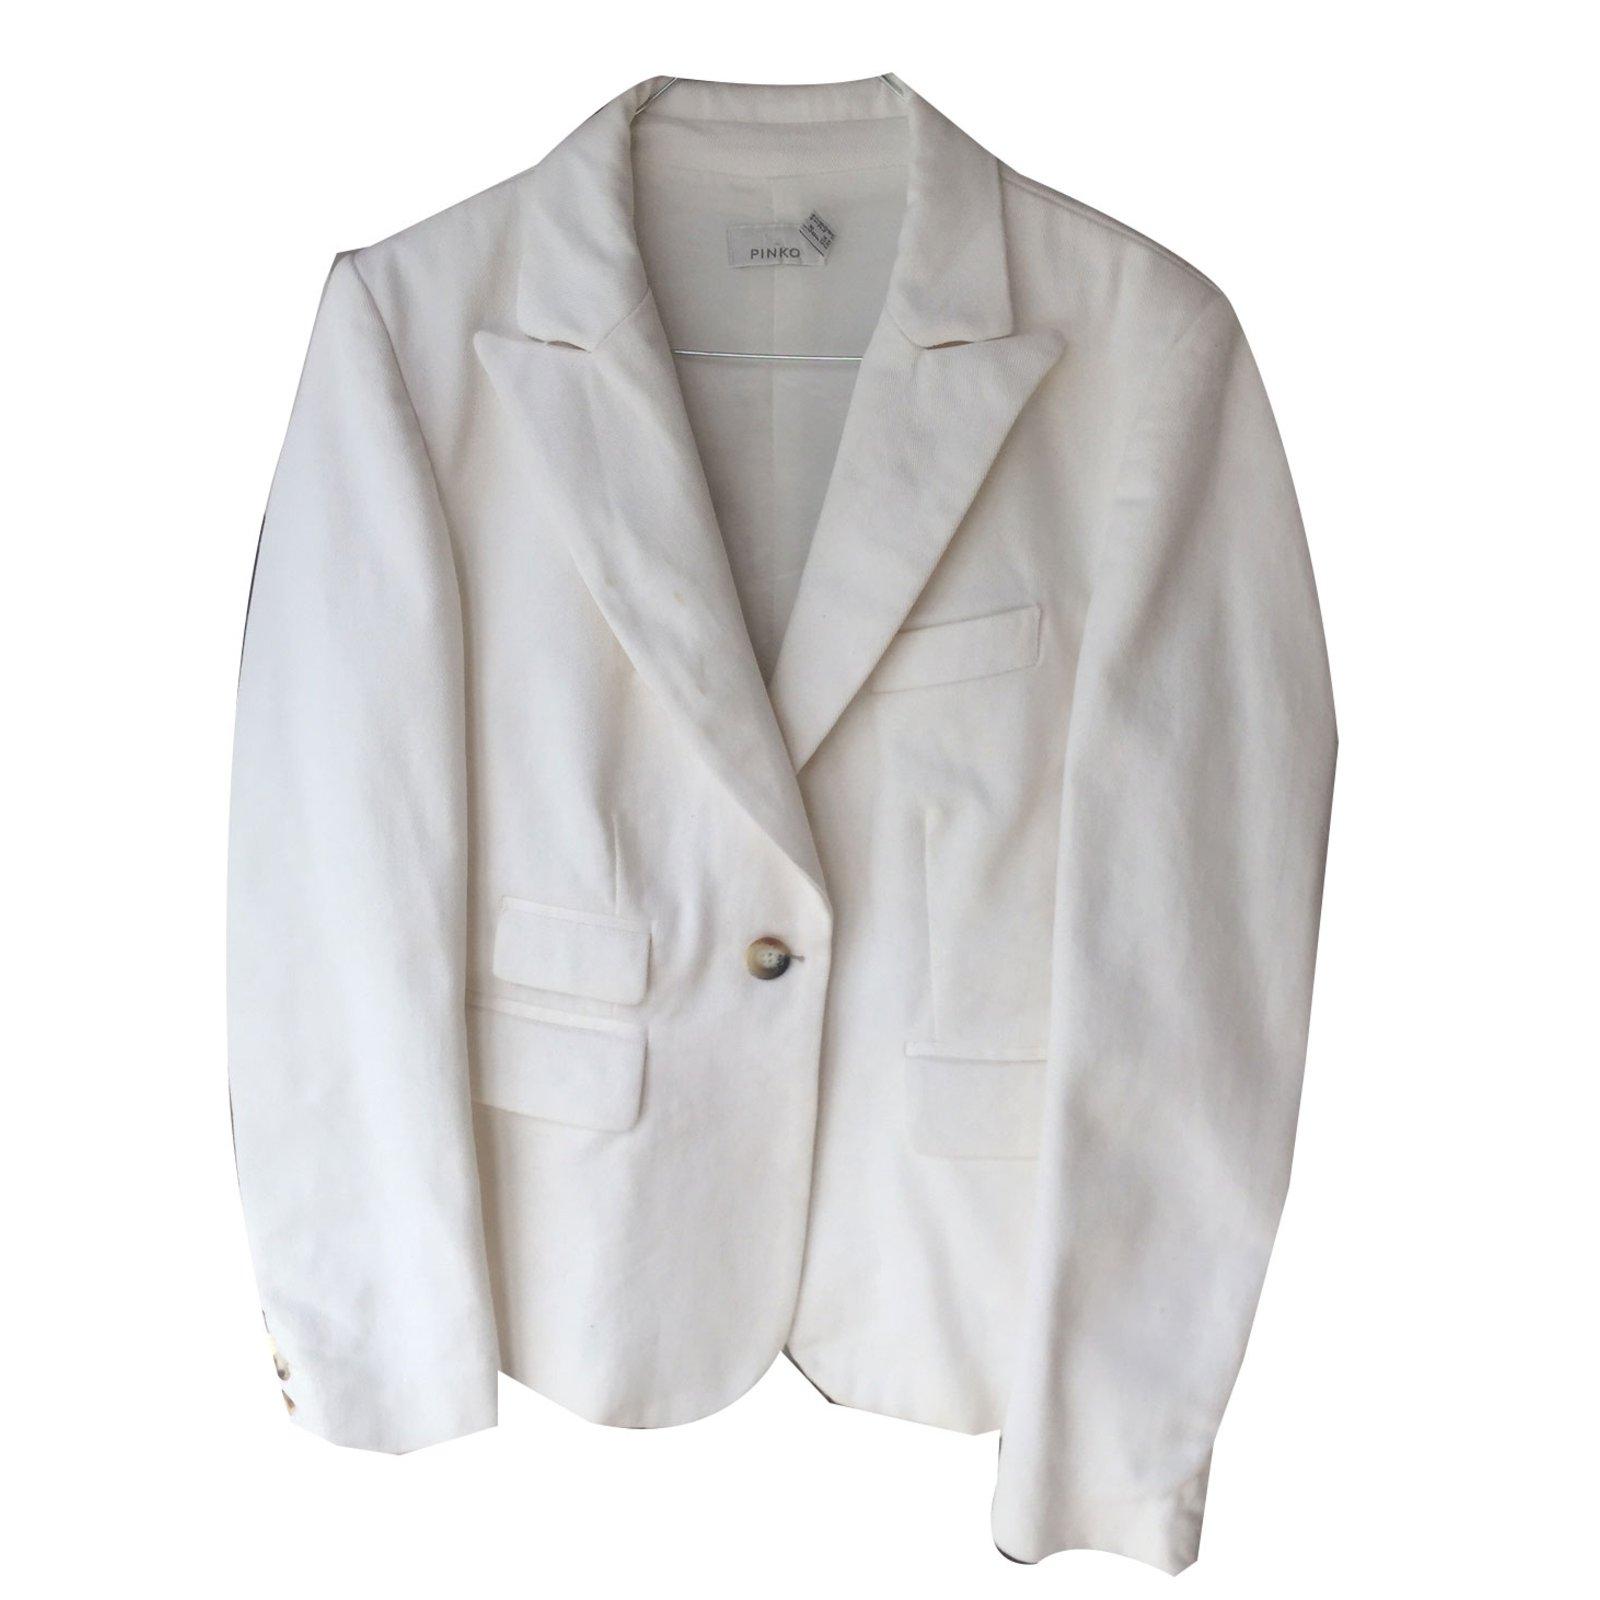 38375 Ref Tëte Pinko Blazer Cassé Mort Vestes Blanc Coton gq8xUnw0